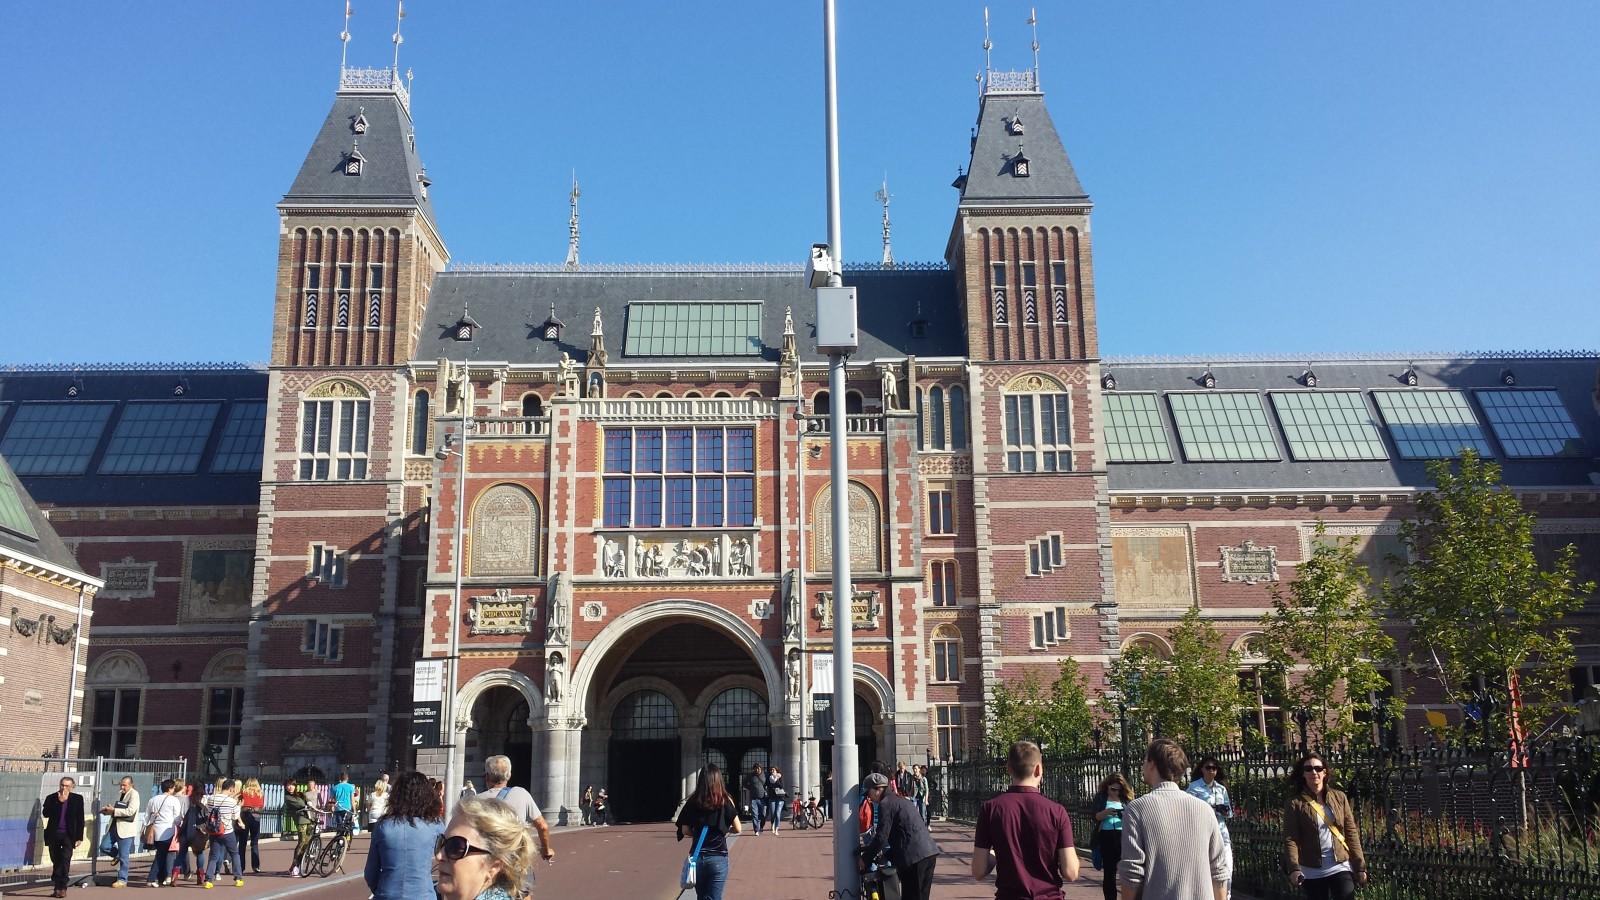 20141003_115738  Rijksmuseum